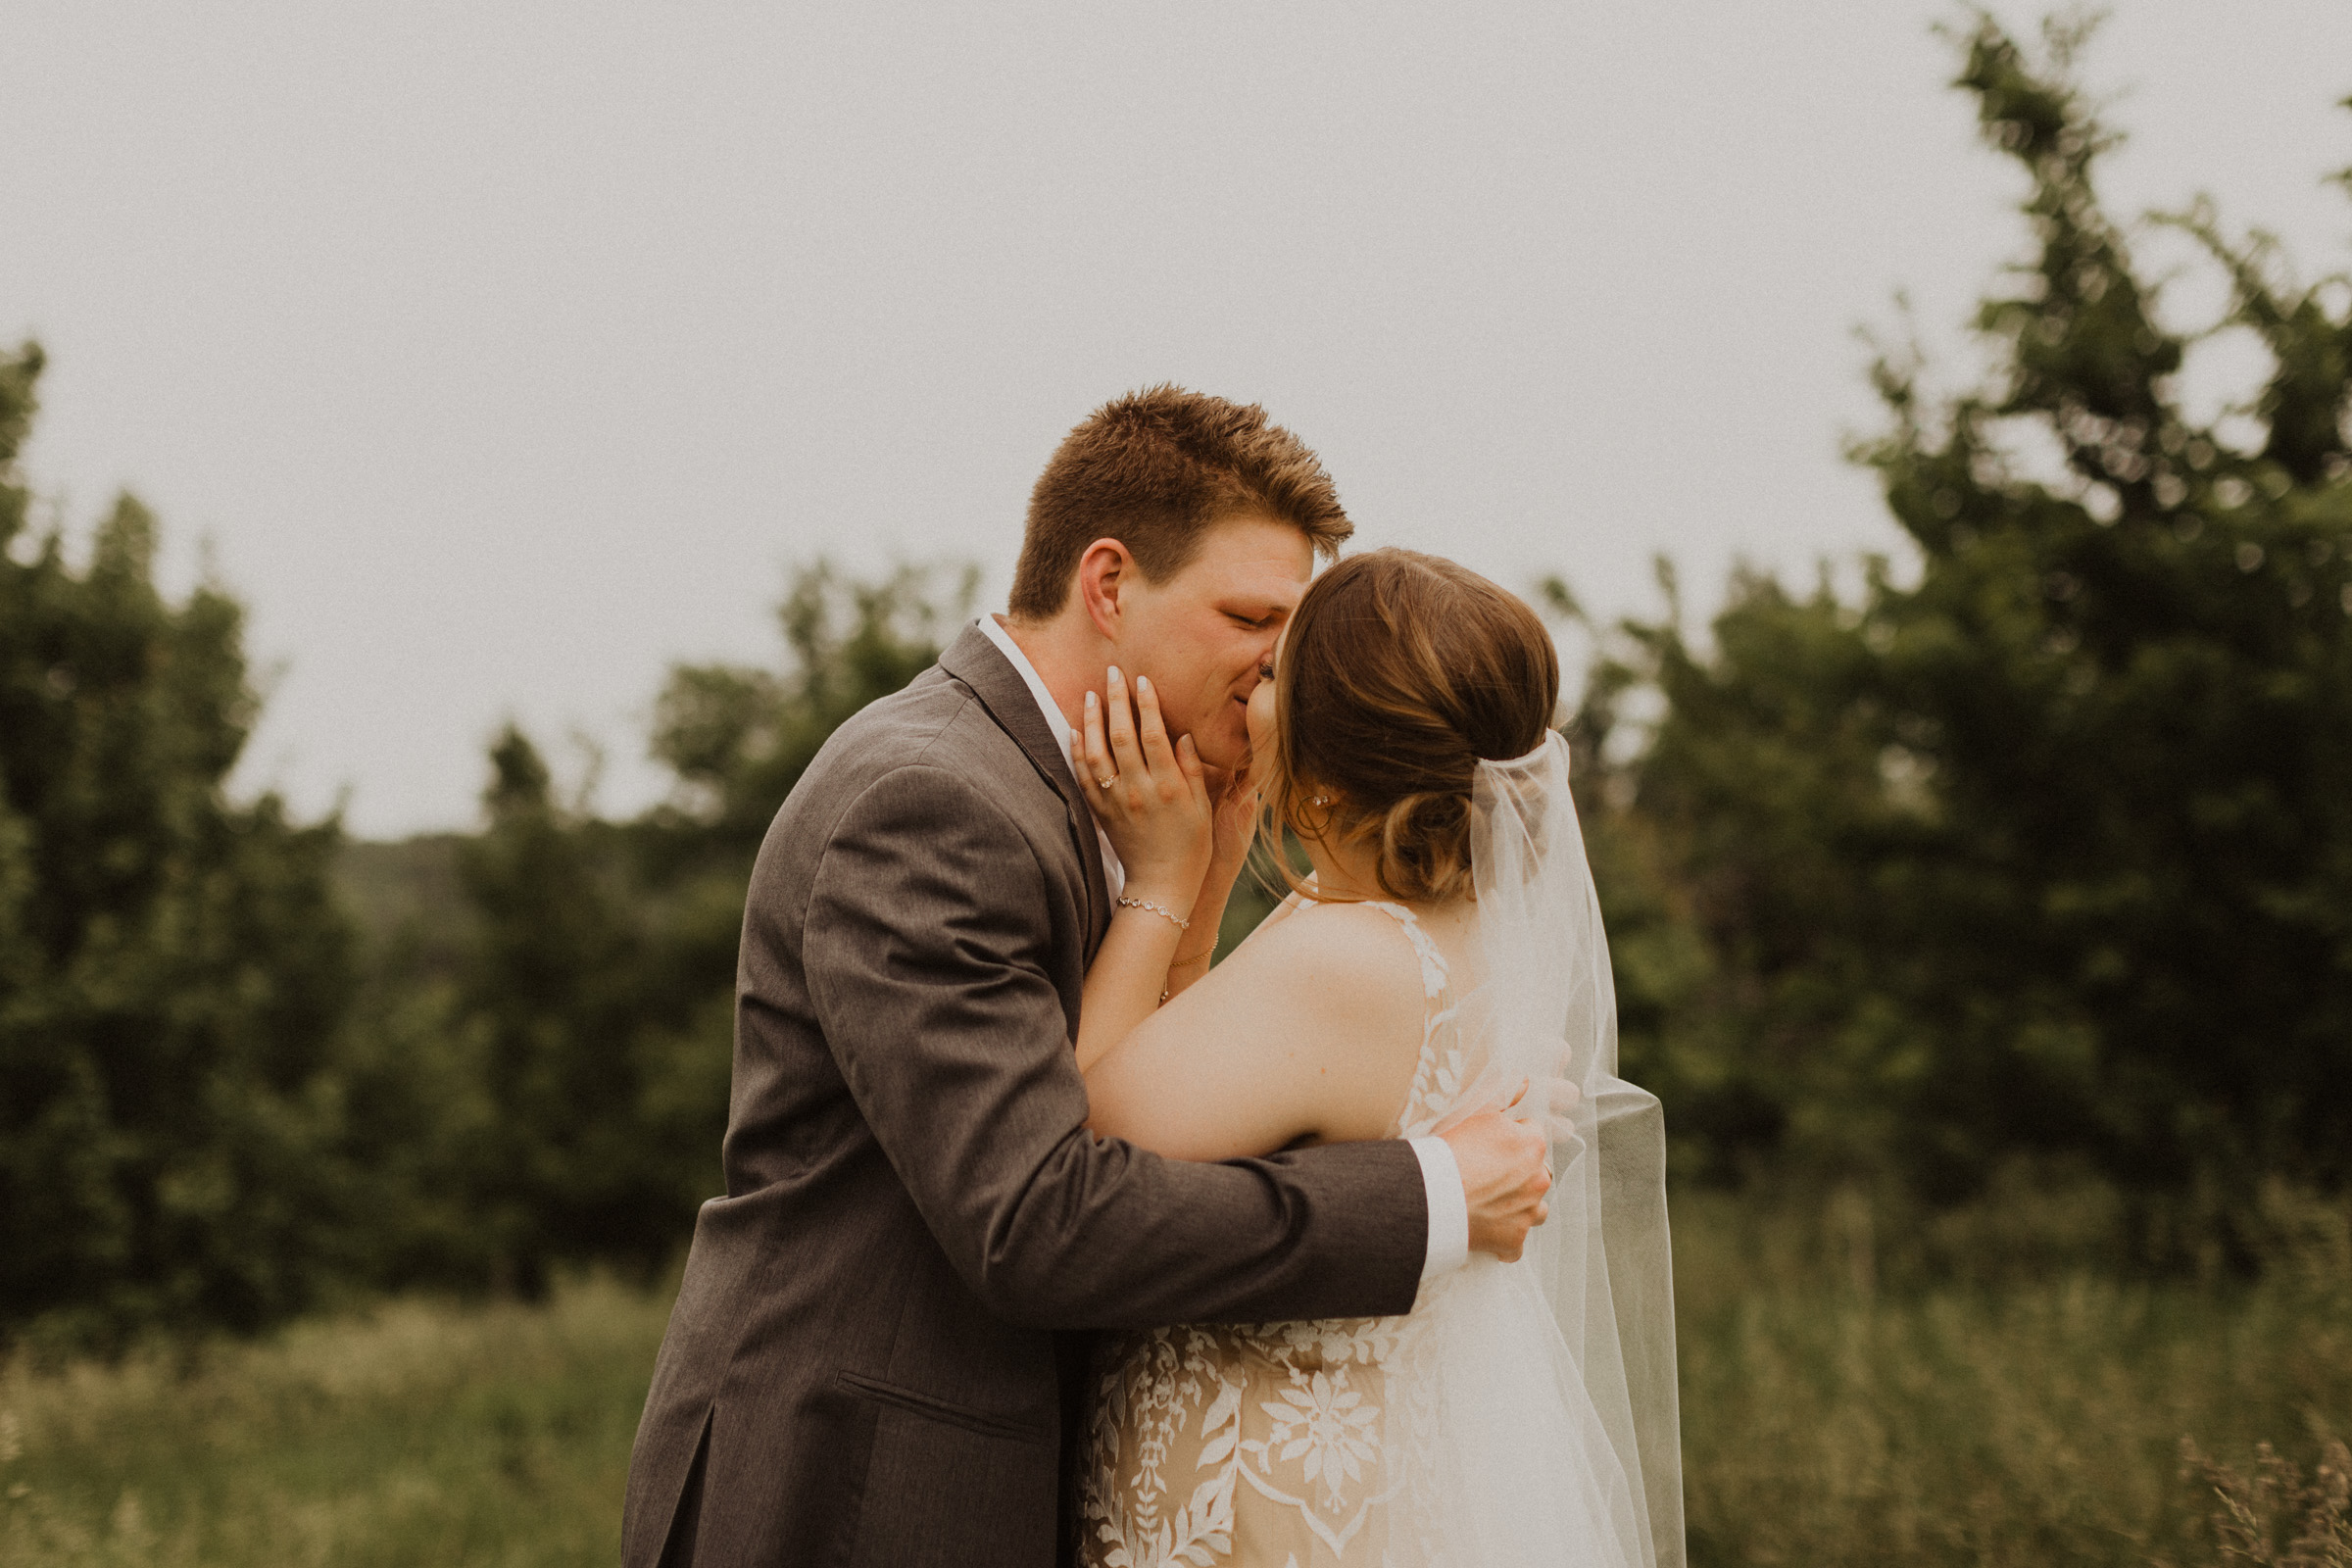 alyssa barletter photography weston red barn farm timberbarn summer outdoor wedding-16.jpg